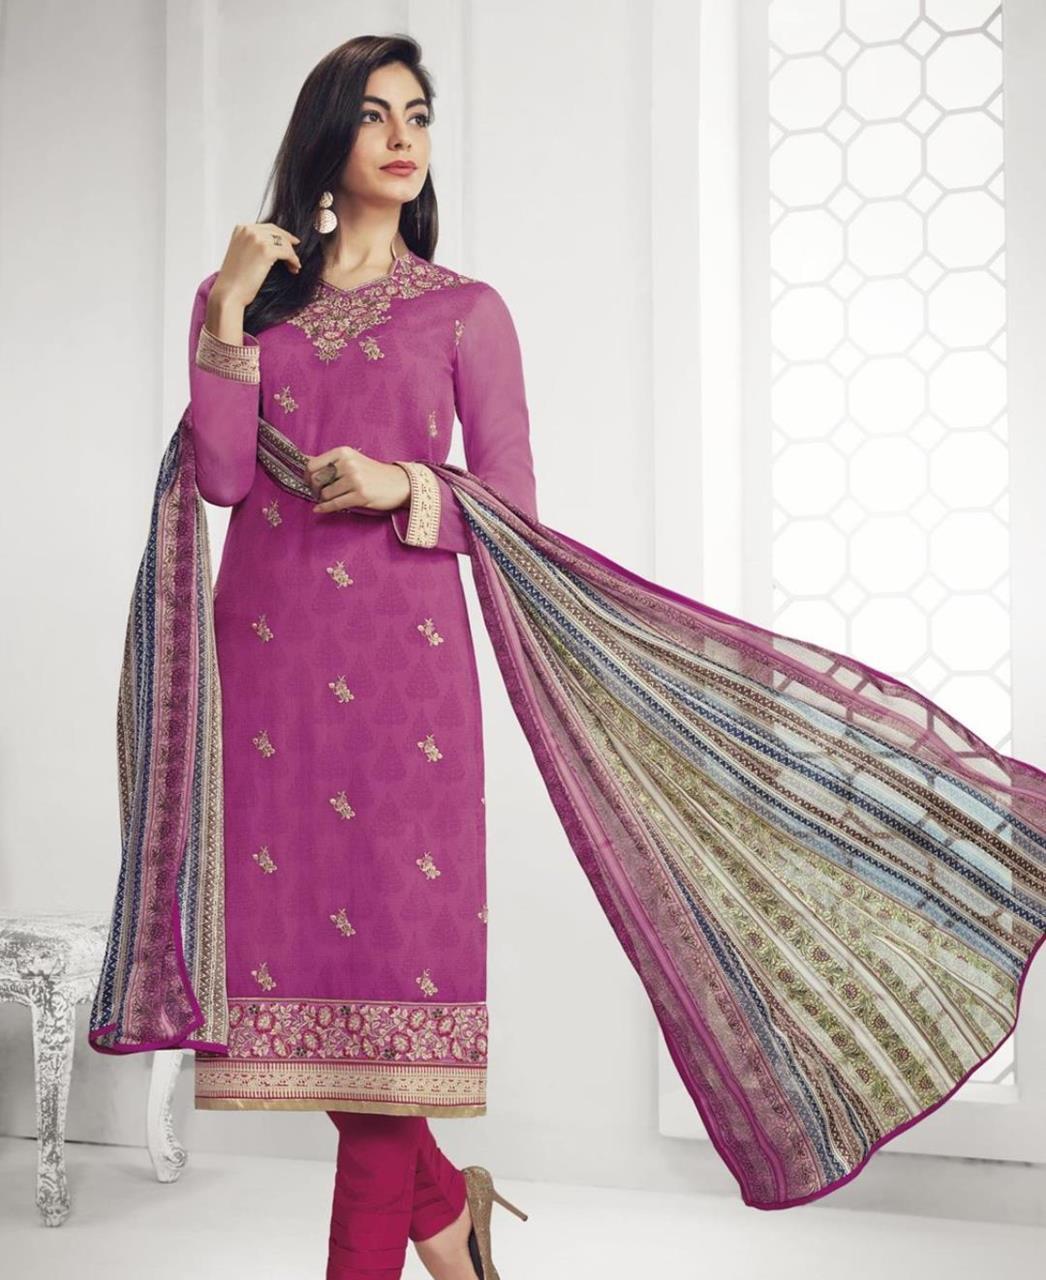 Stone Work Georgette Straight cut Salwar Kameez in Magenta Pink